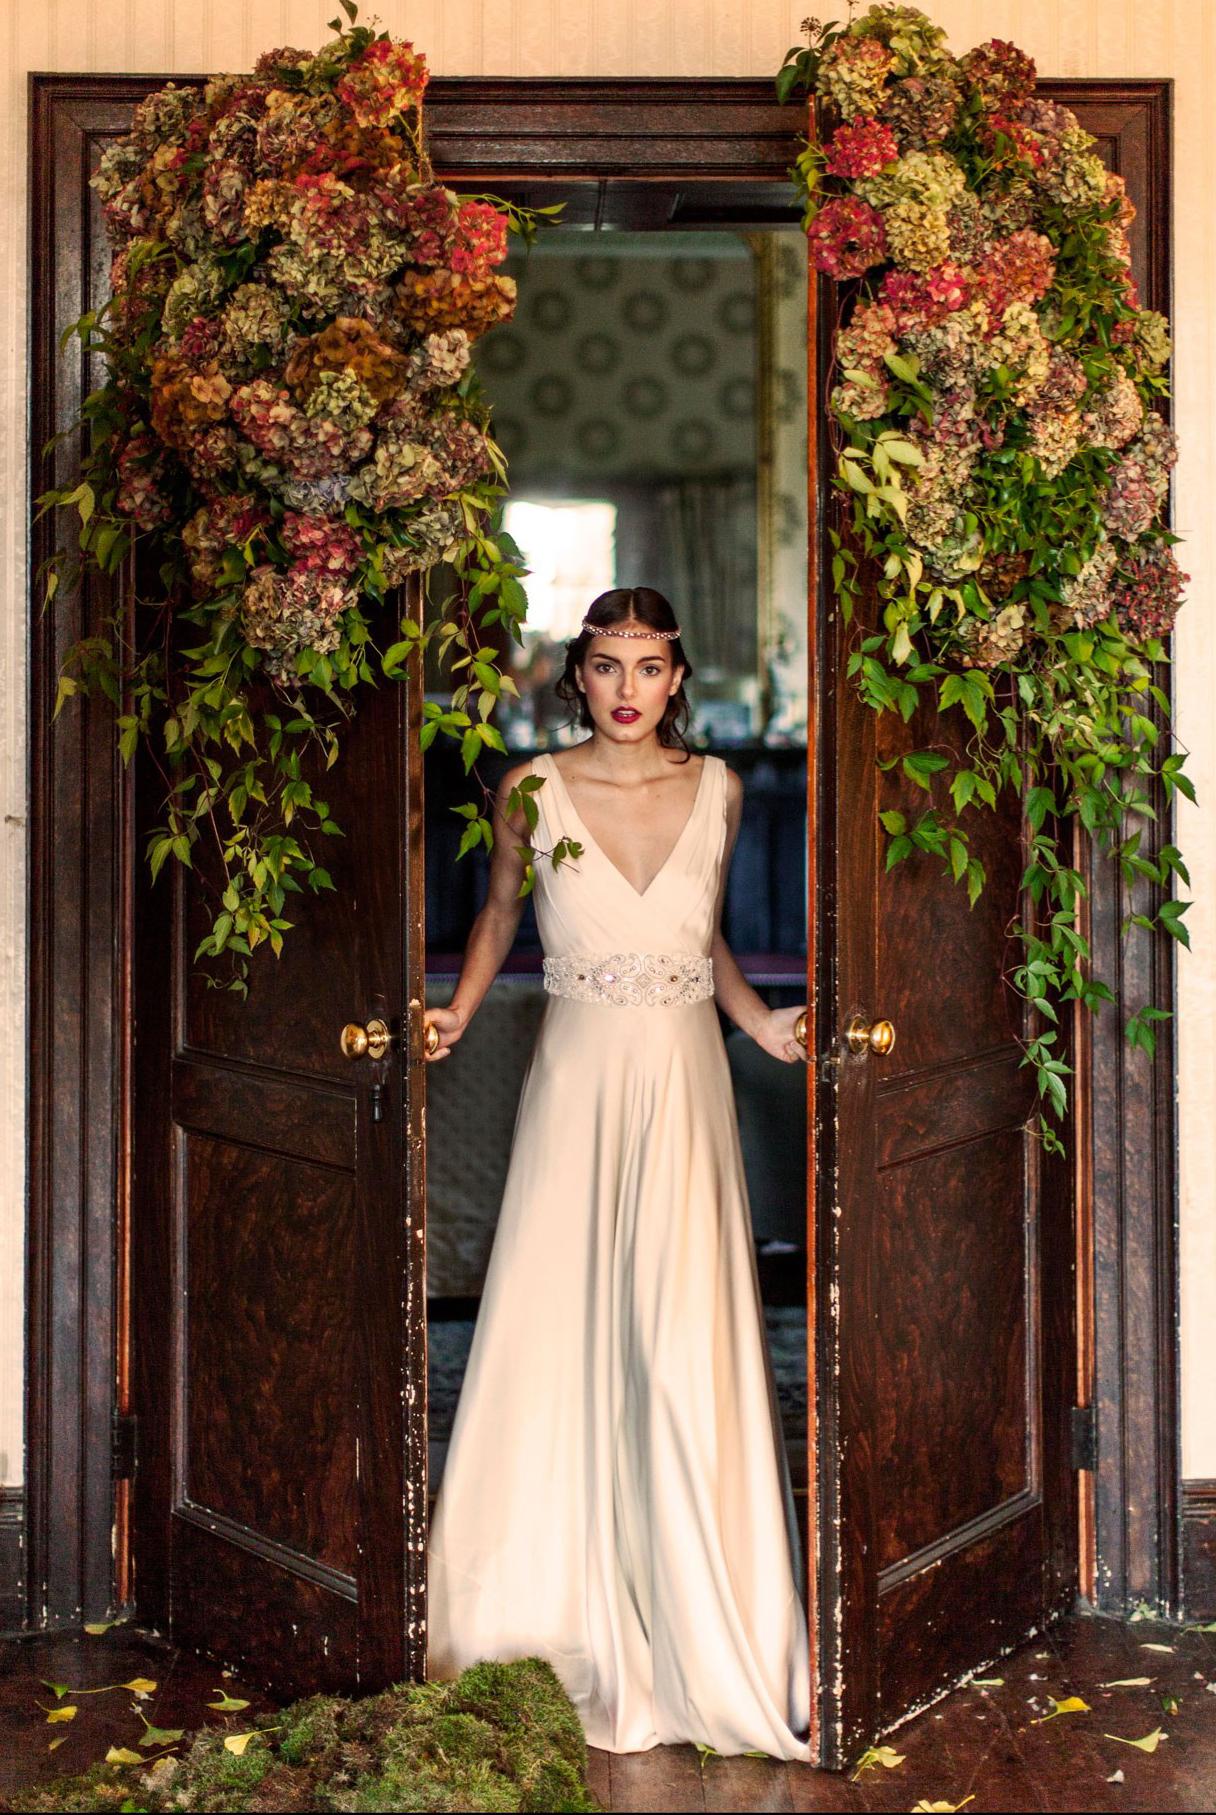 Shot3-pennard-house-brides-9jan14_EmmaLewis_b.jpg